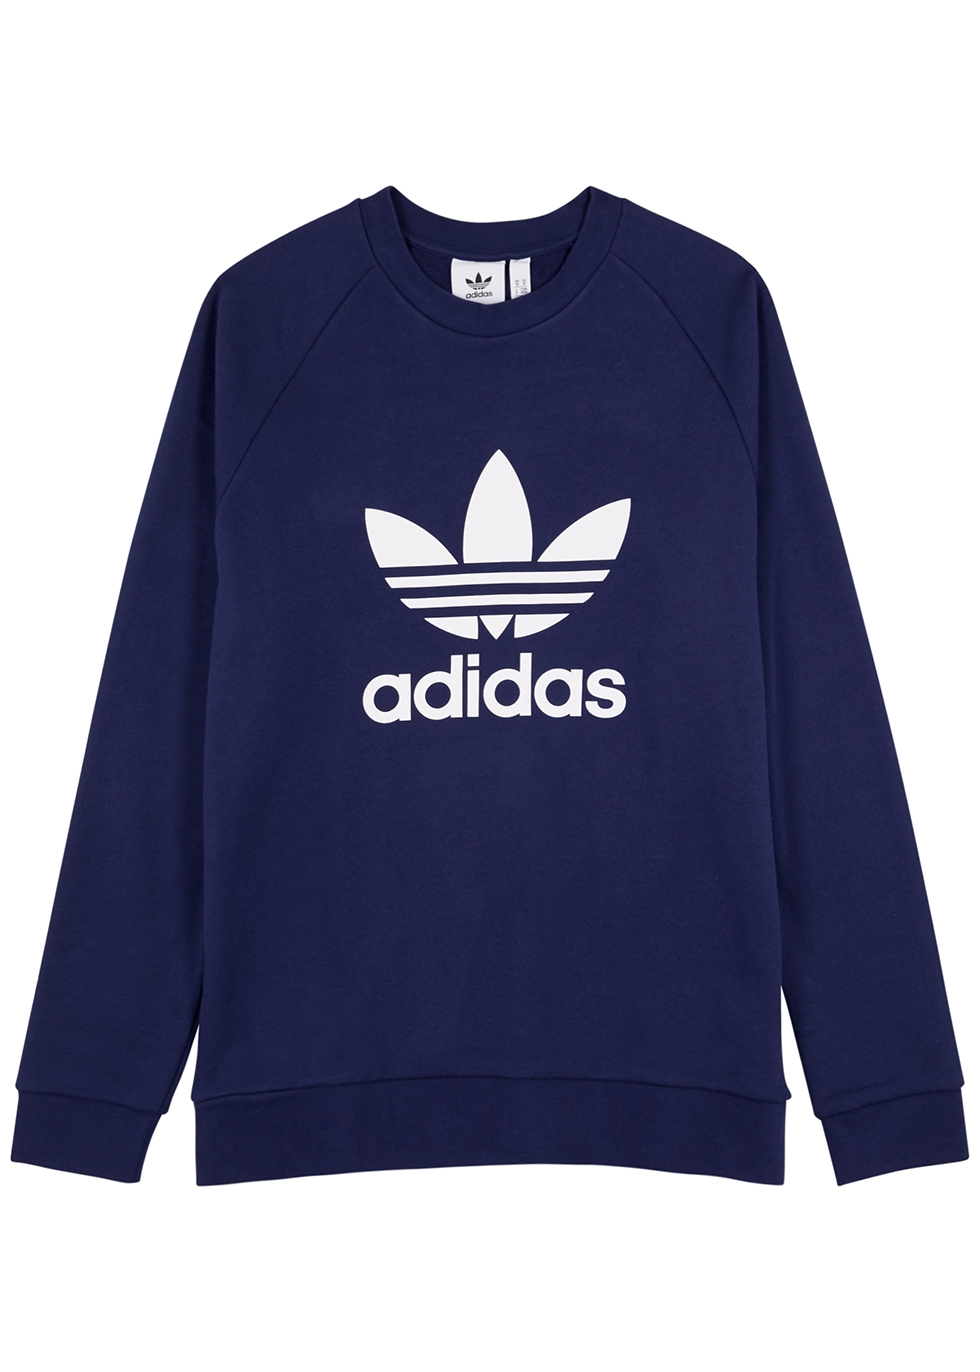 Navy logo cotton sweatshirt